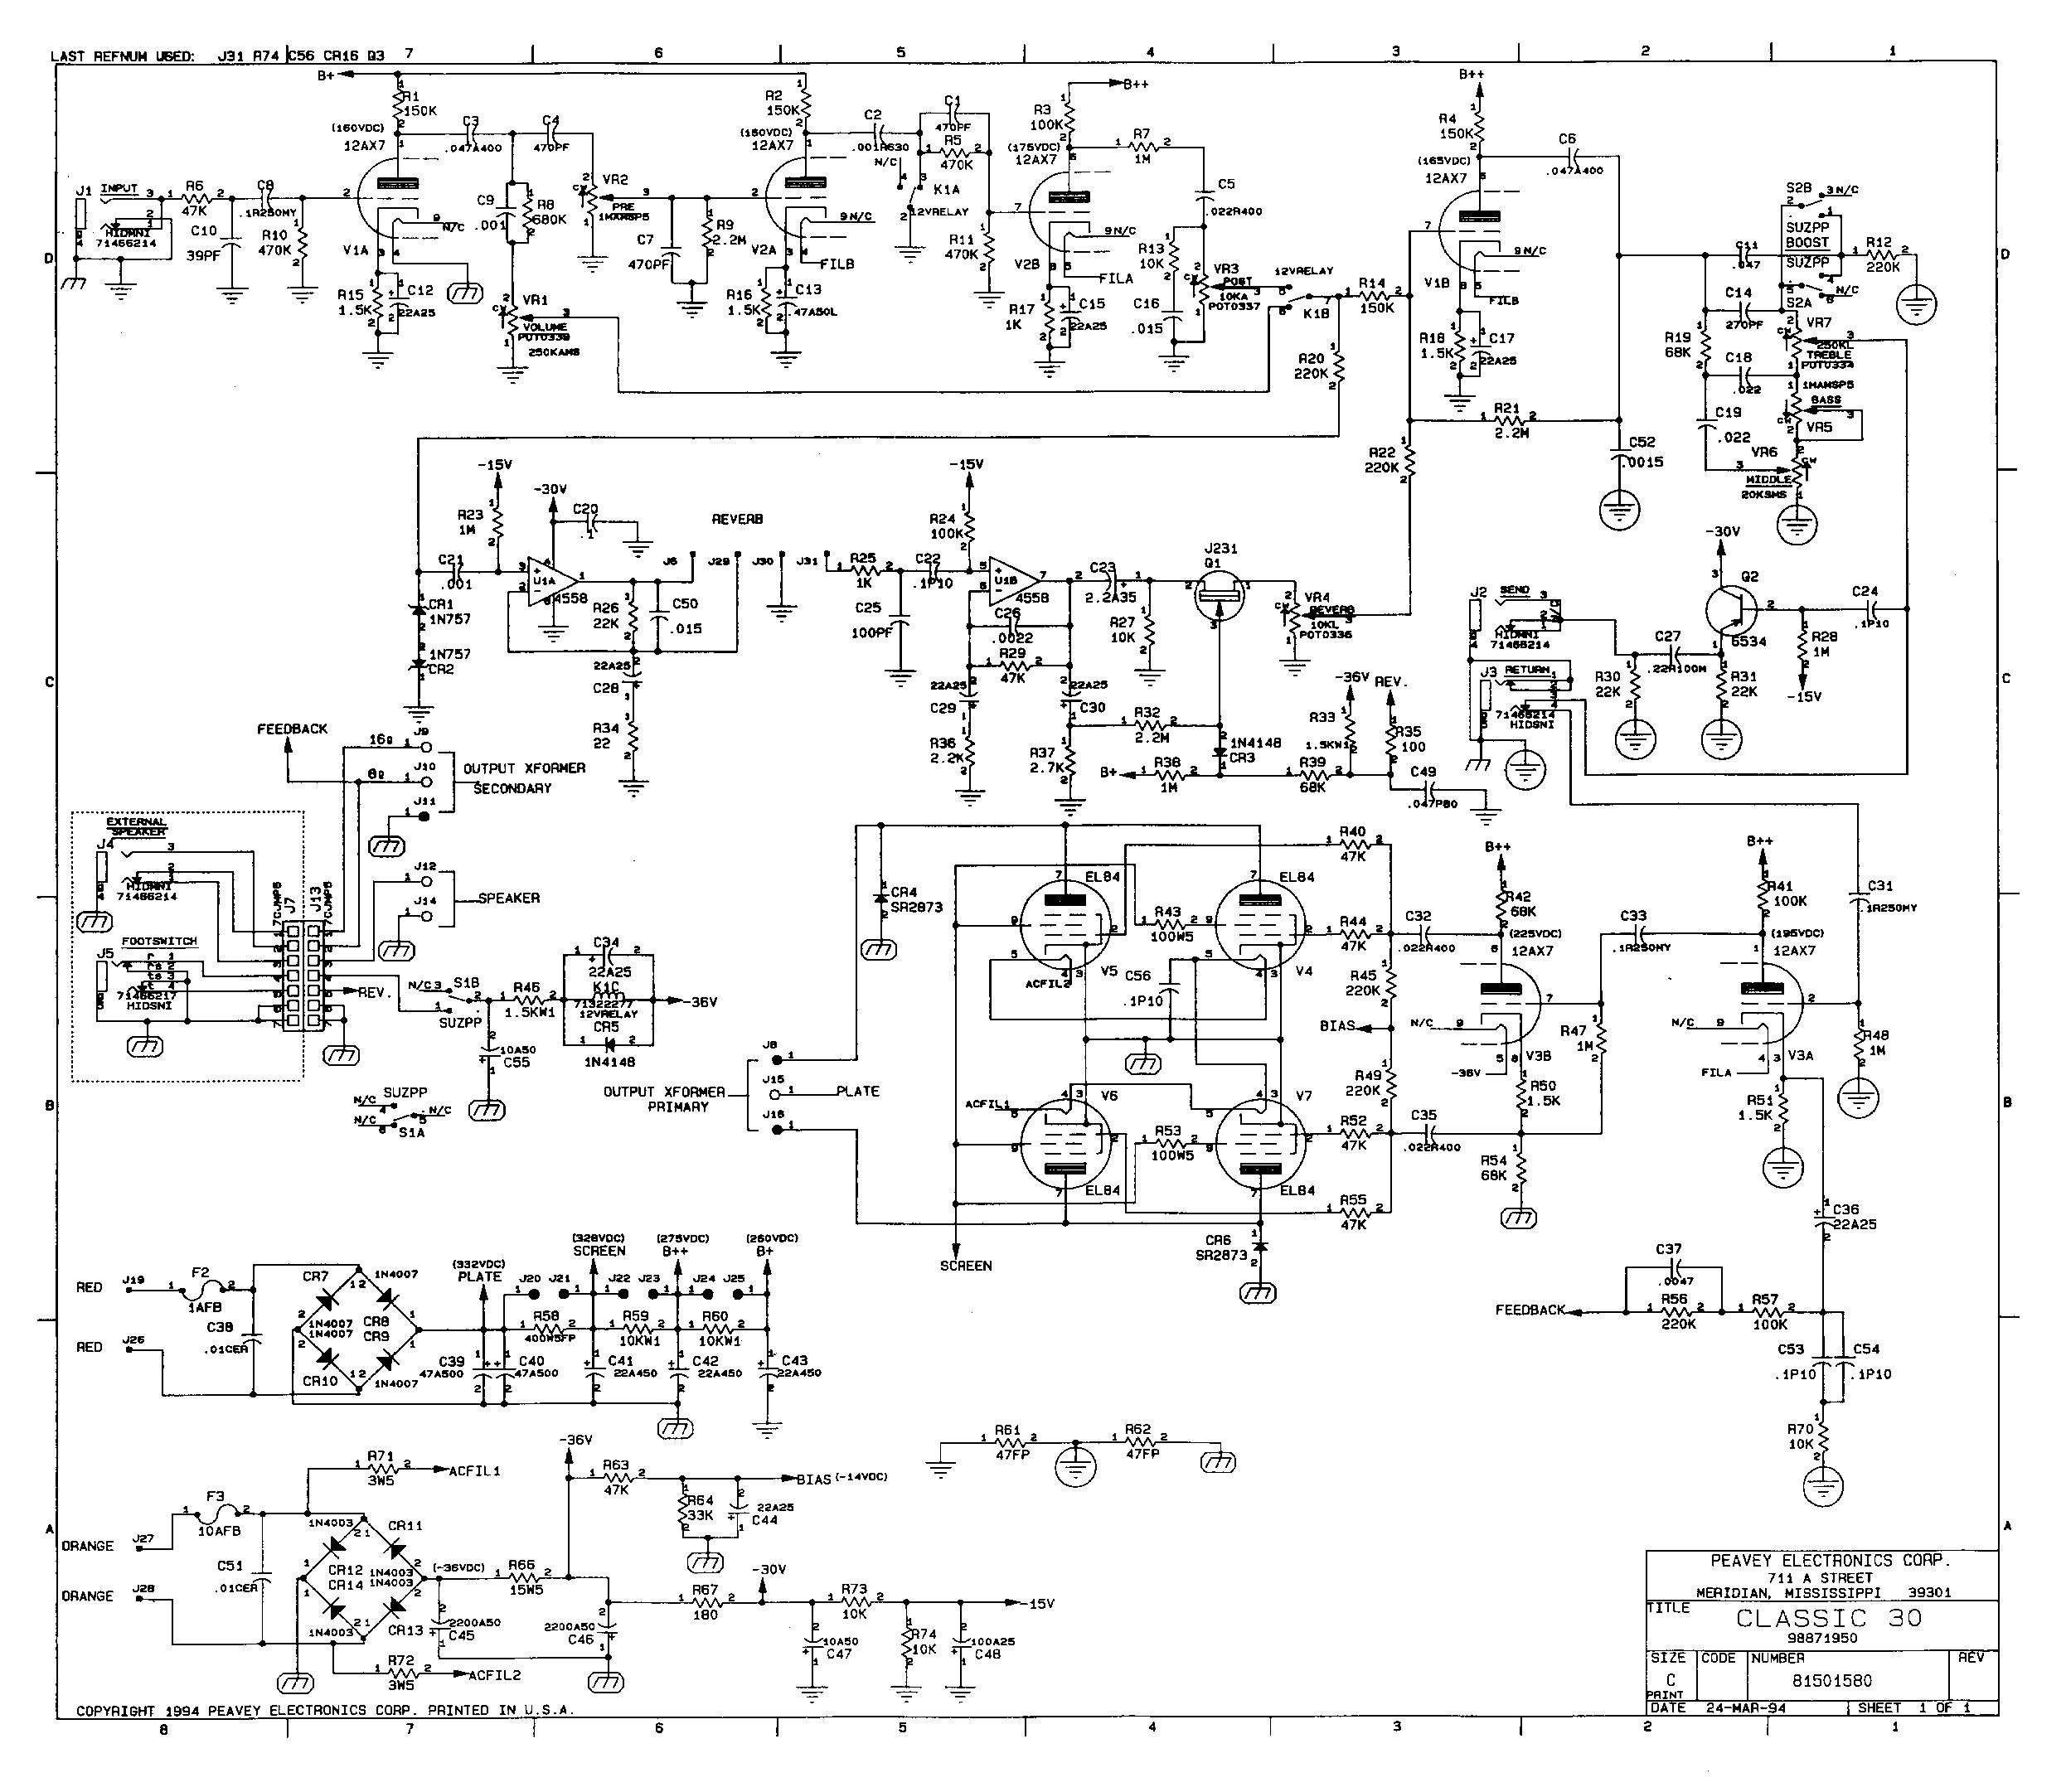 Guitar Telstar Wiring Diagram Refrence Peavey T 60 Wiring Diagram Unique Blue Guitar Schematics